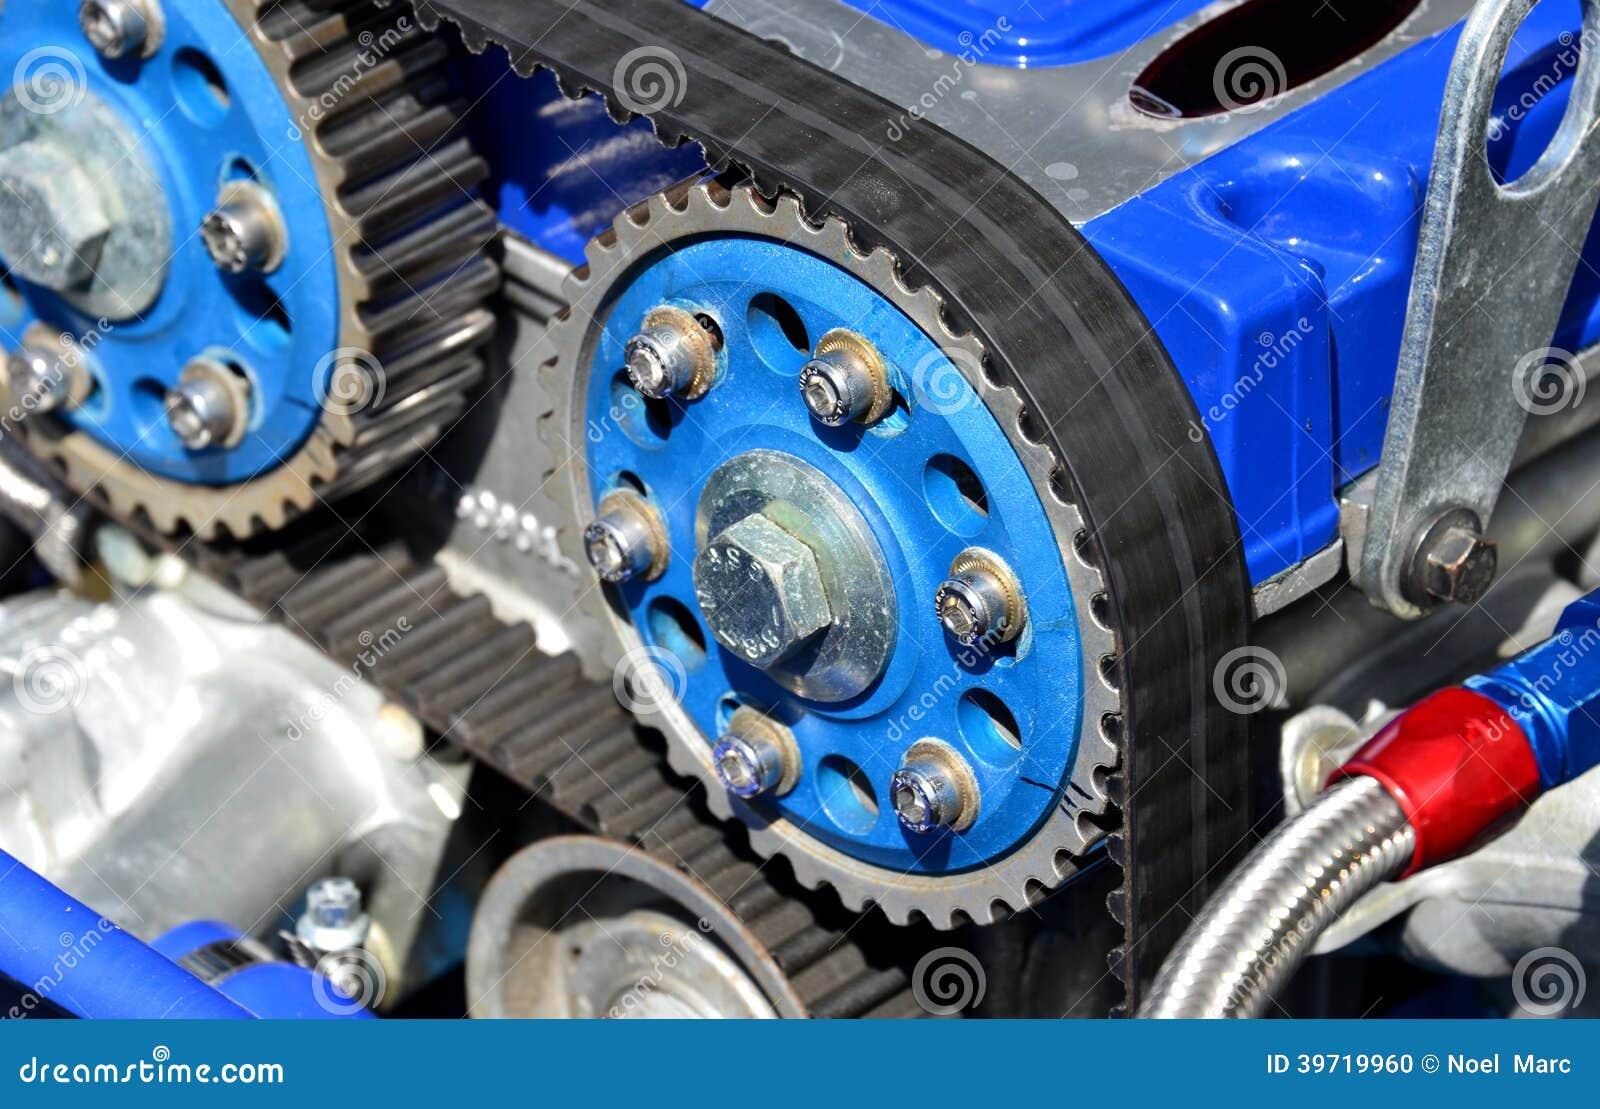 Timing Belt Stock Photo Image  39719960 on Car Engine Timing Belts